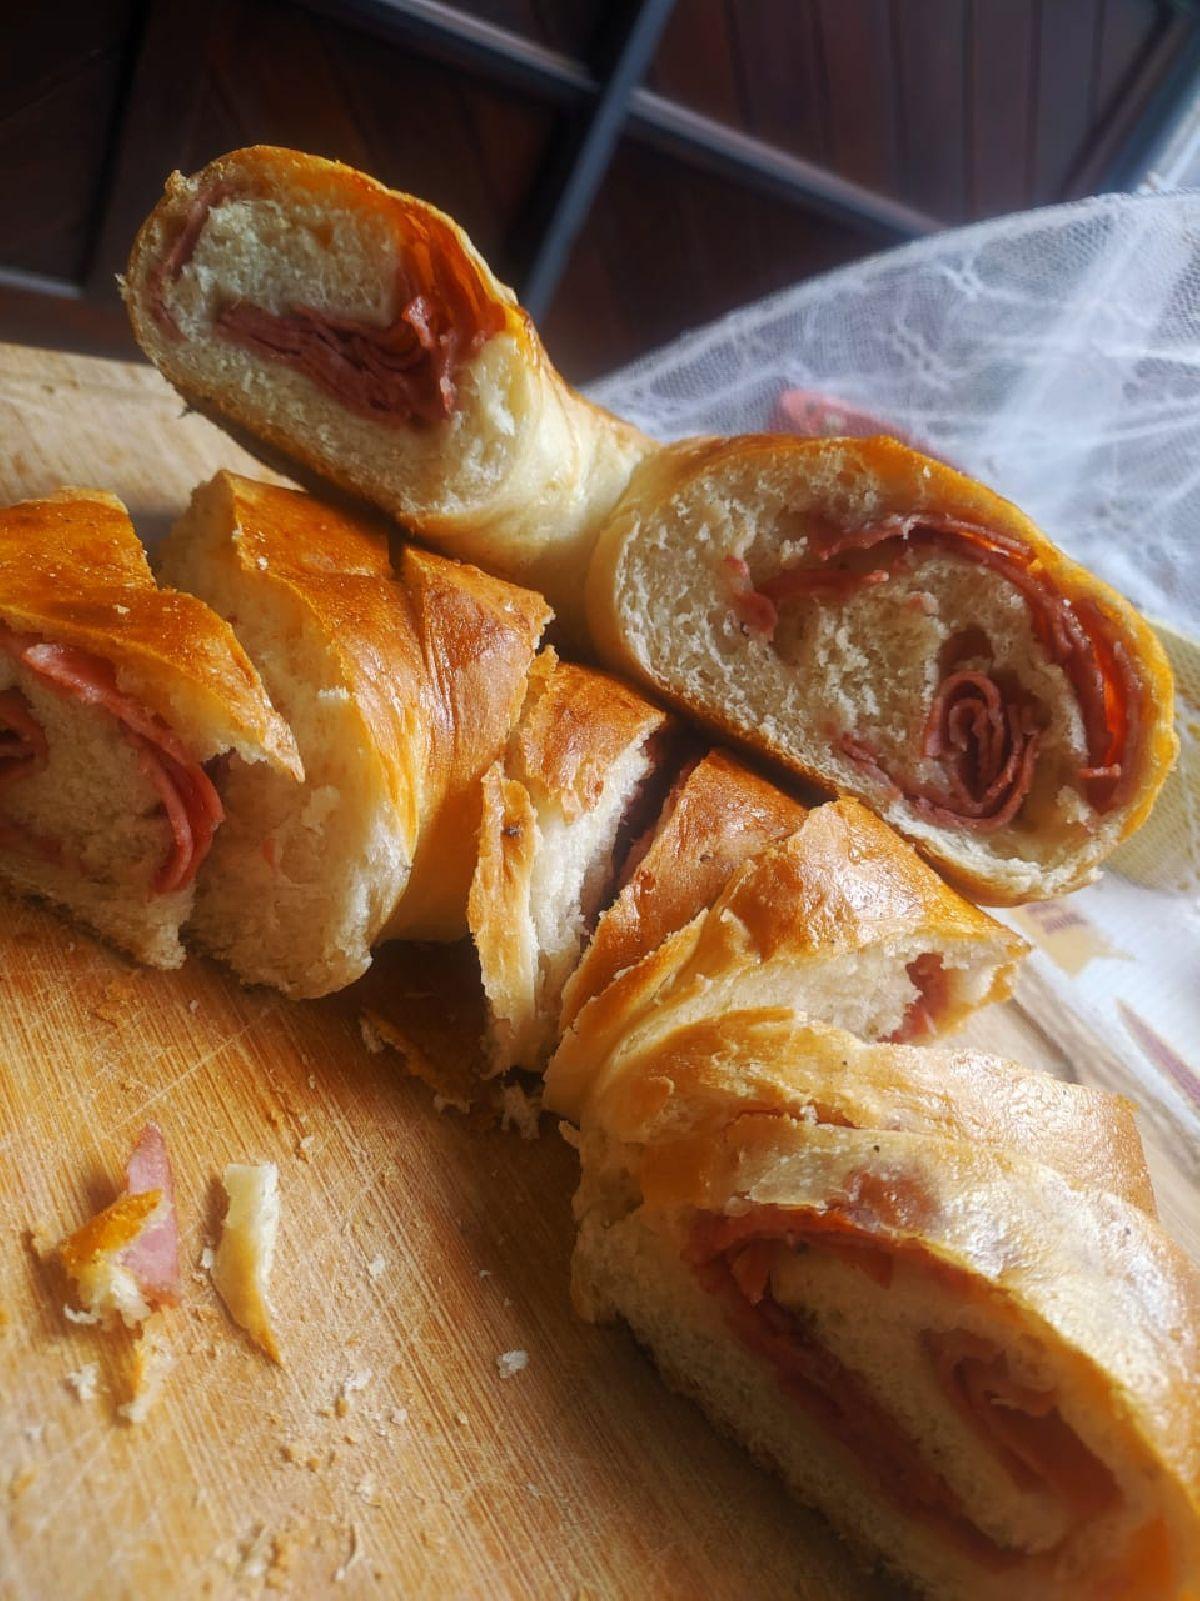 Tortano, Filão Italiano e Cinnamon Roll na Pane Di Marchi, para fechar a semana